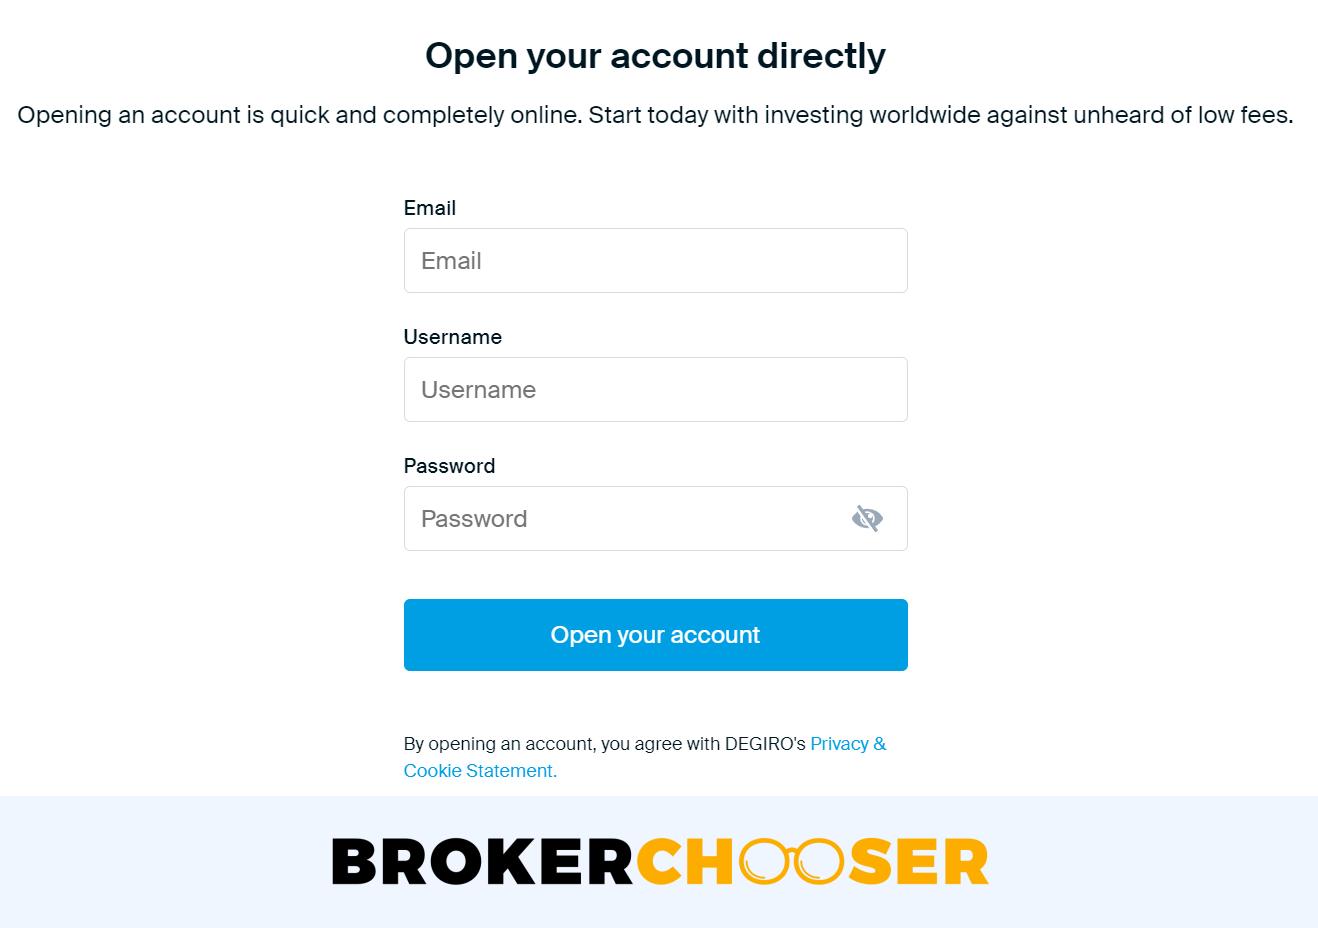 Can I have two DEGIRO accounts? - Account opening